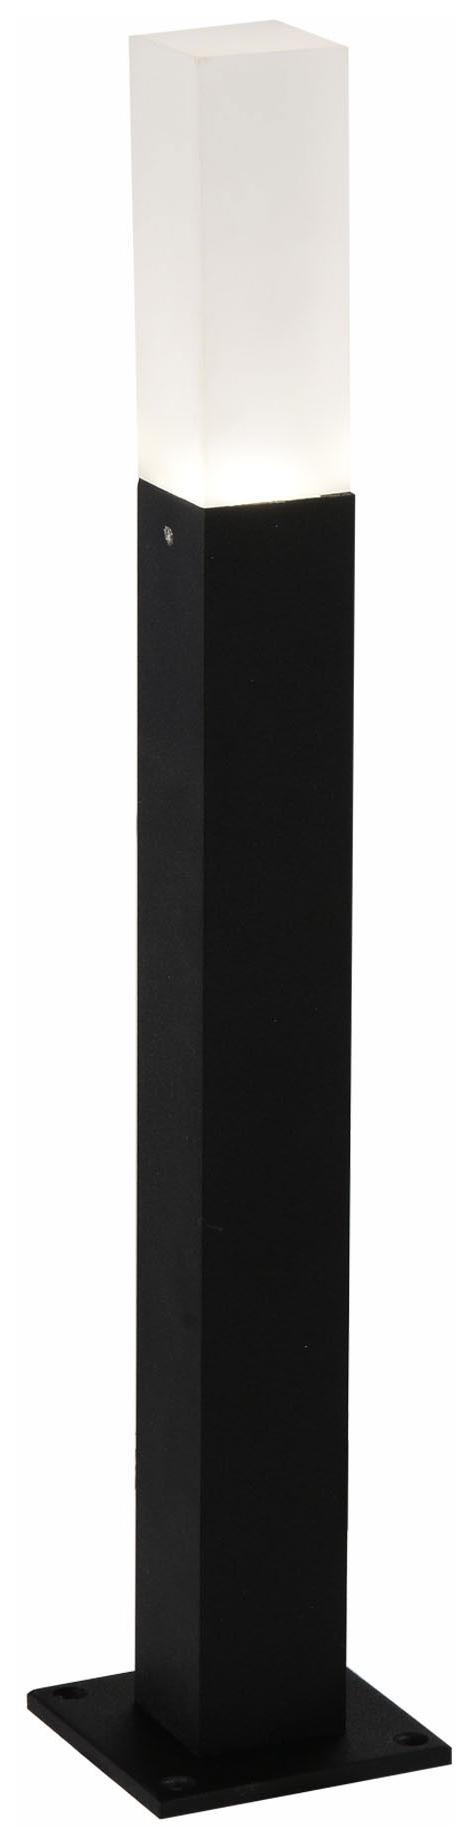 Ландшафтный столбик ST Luce SL101.405.01